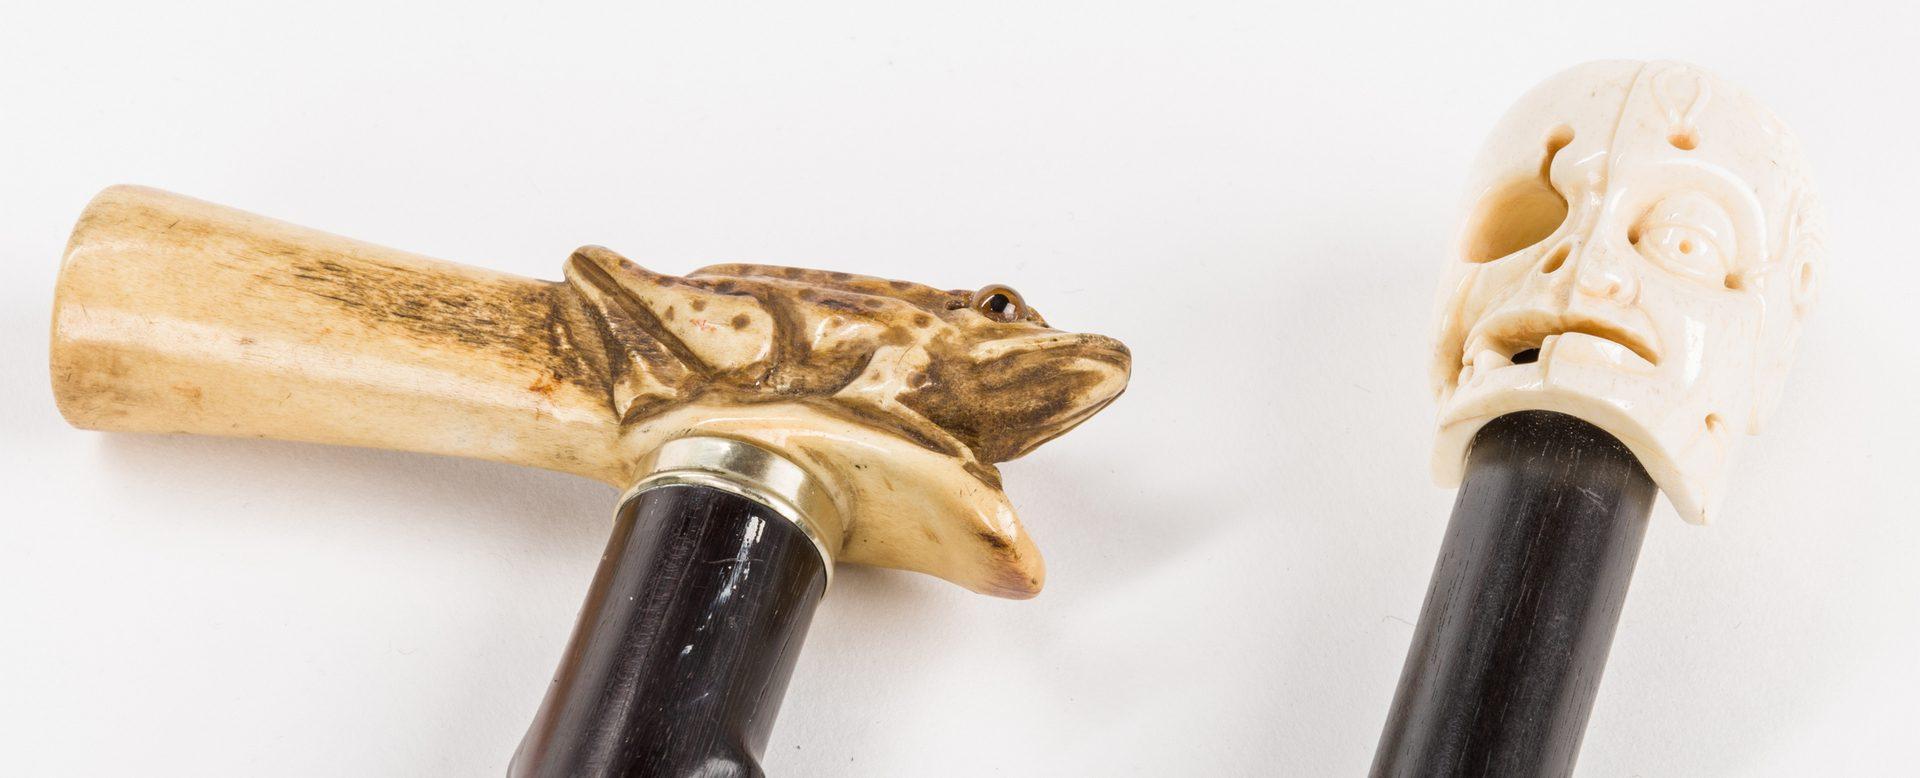 Lot 656: 2 Asian Frog and Skull Walking Sticks